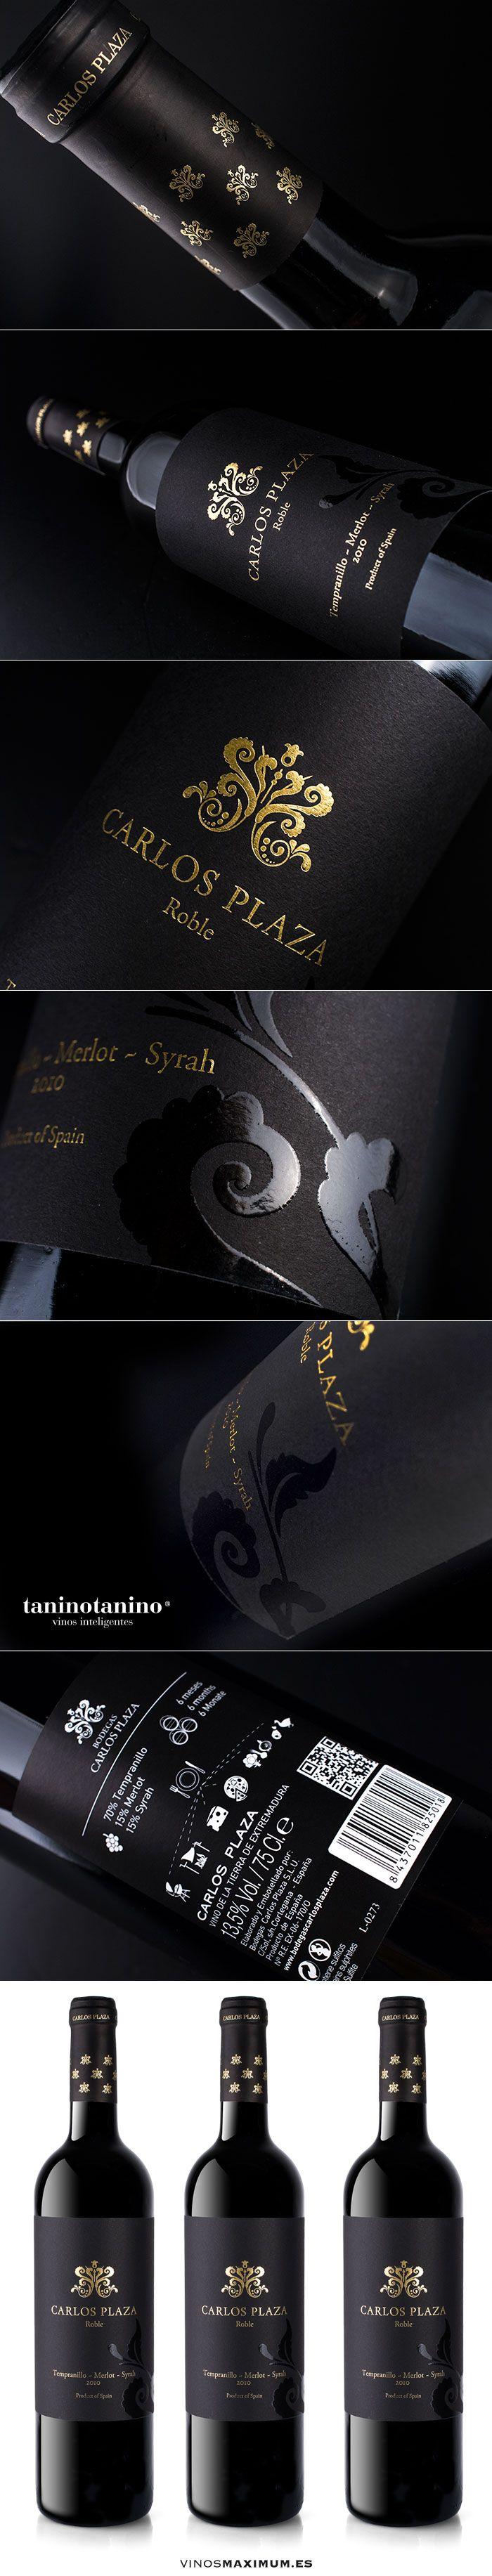 CARLOS PLAZA ROBLE 2010 - TANINOTANINO VINOS INTELIGENTES - VINOS MAXIMUM Photo by #winebrandingdesign (Vine Bottle Design)